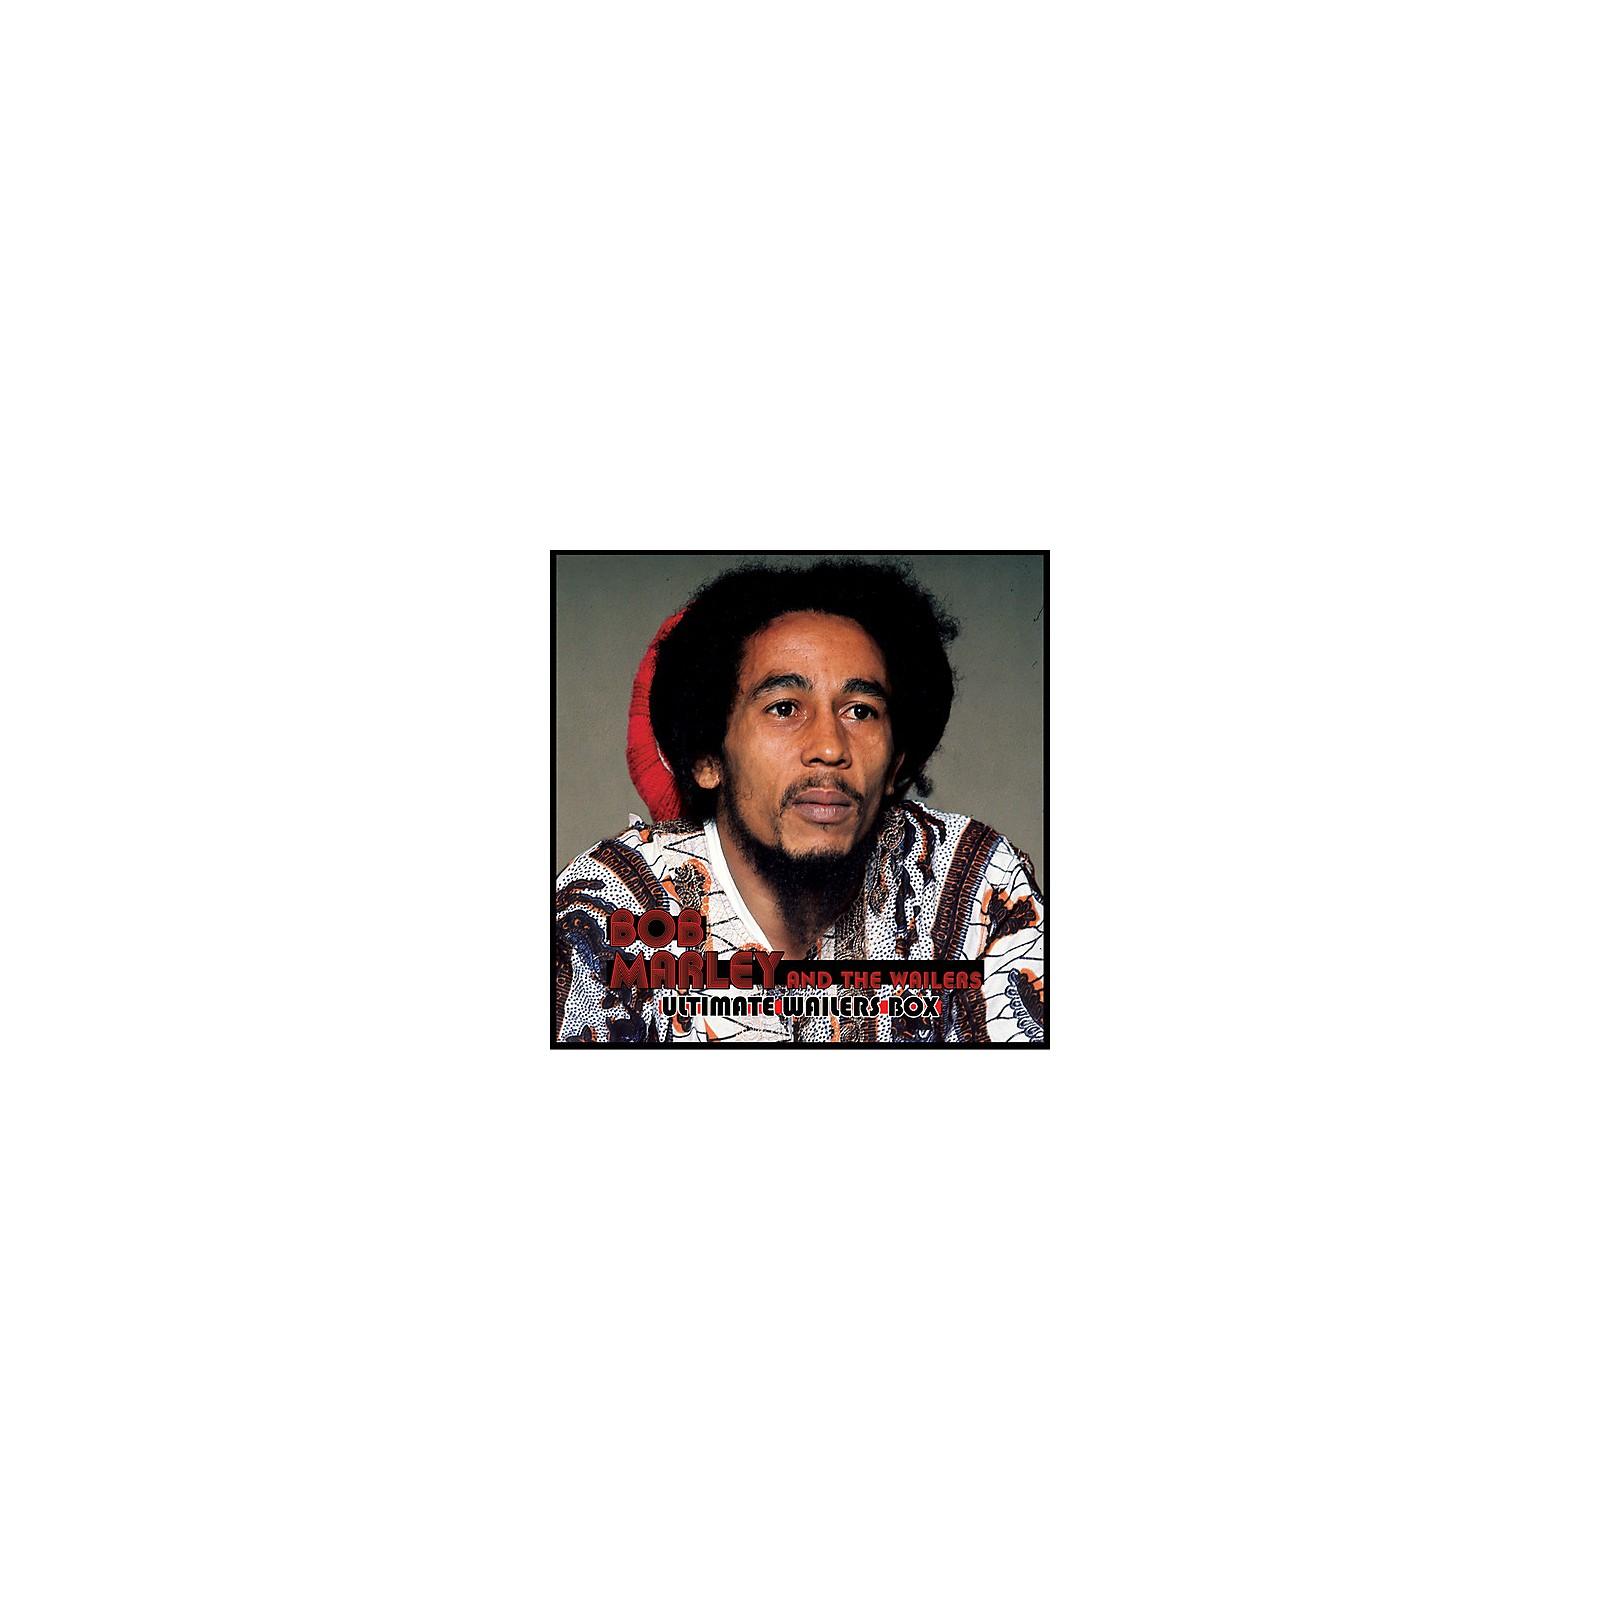 Alliance Bob Marley & the Wailers - Ultimate Wailers Box